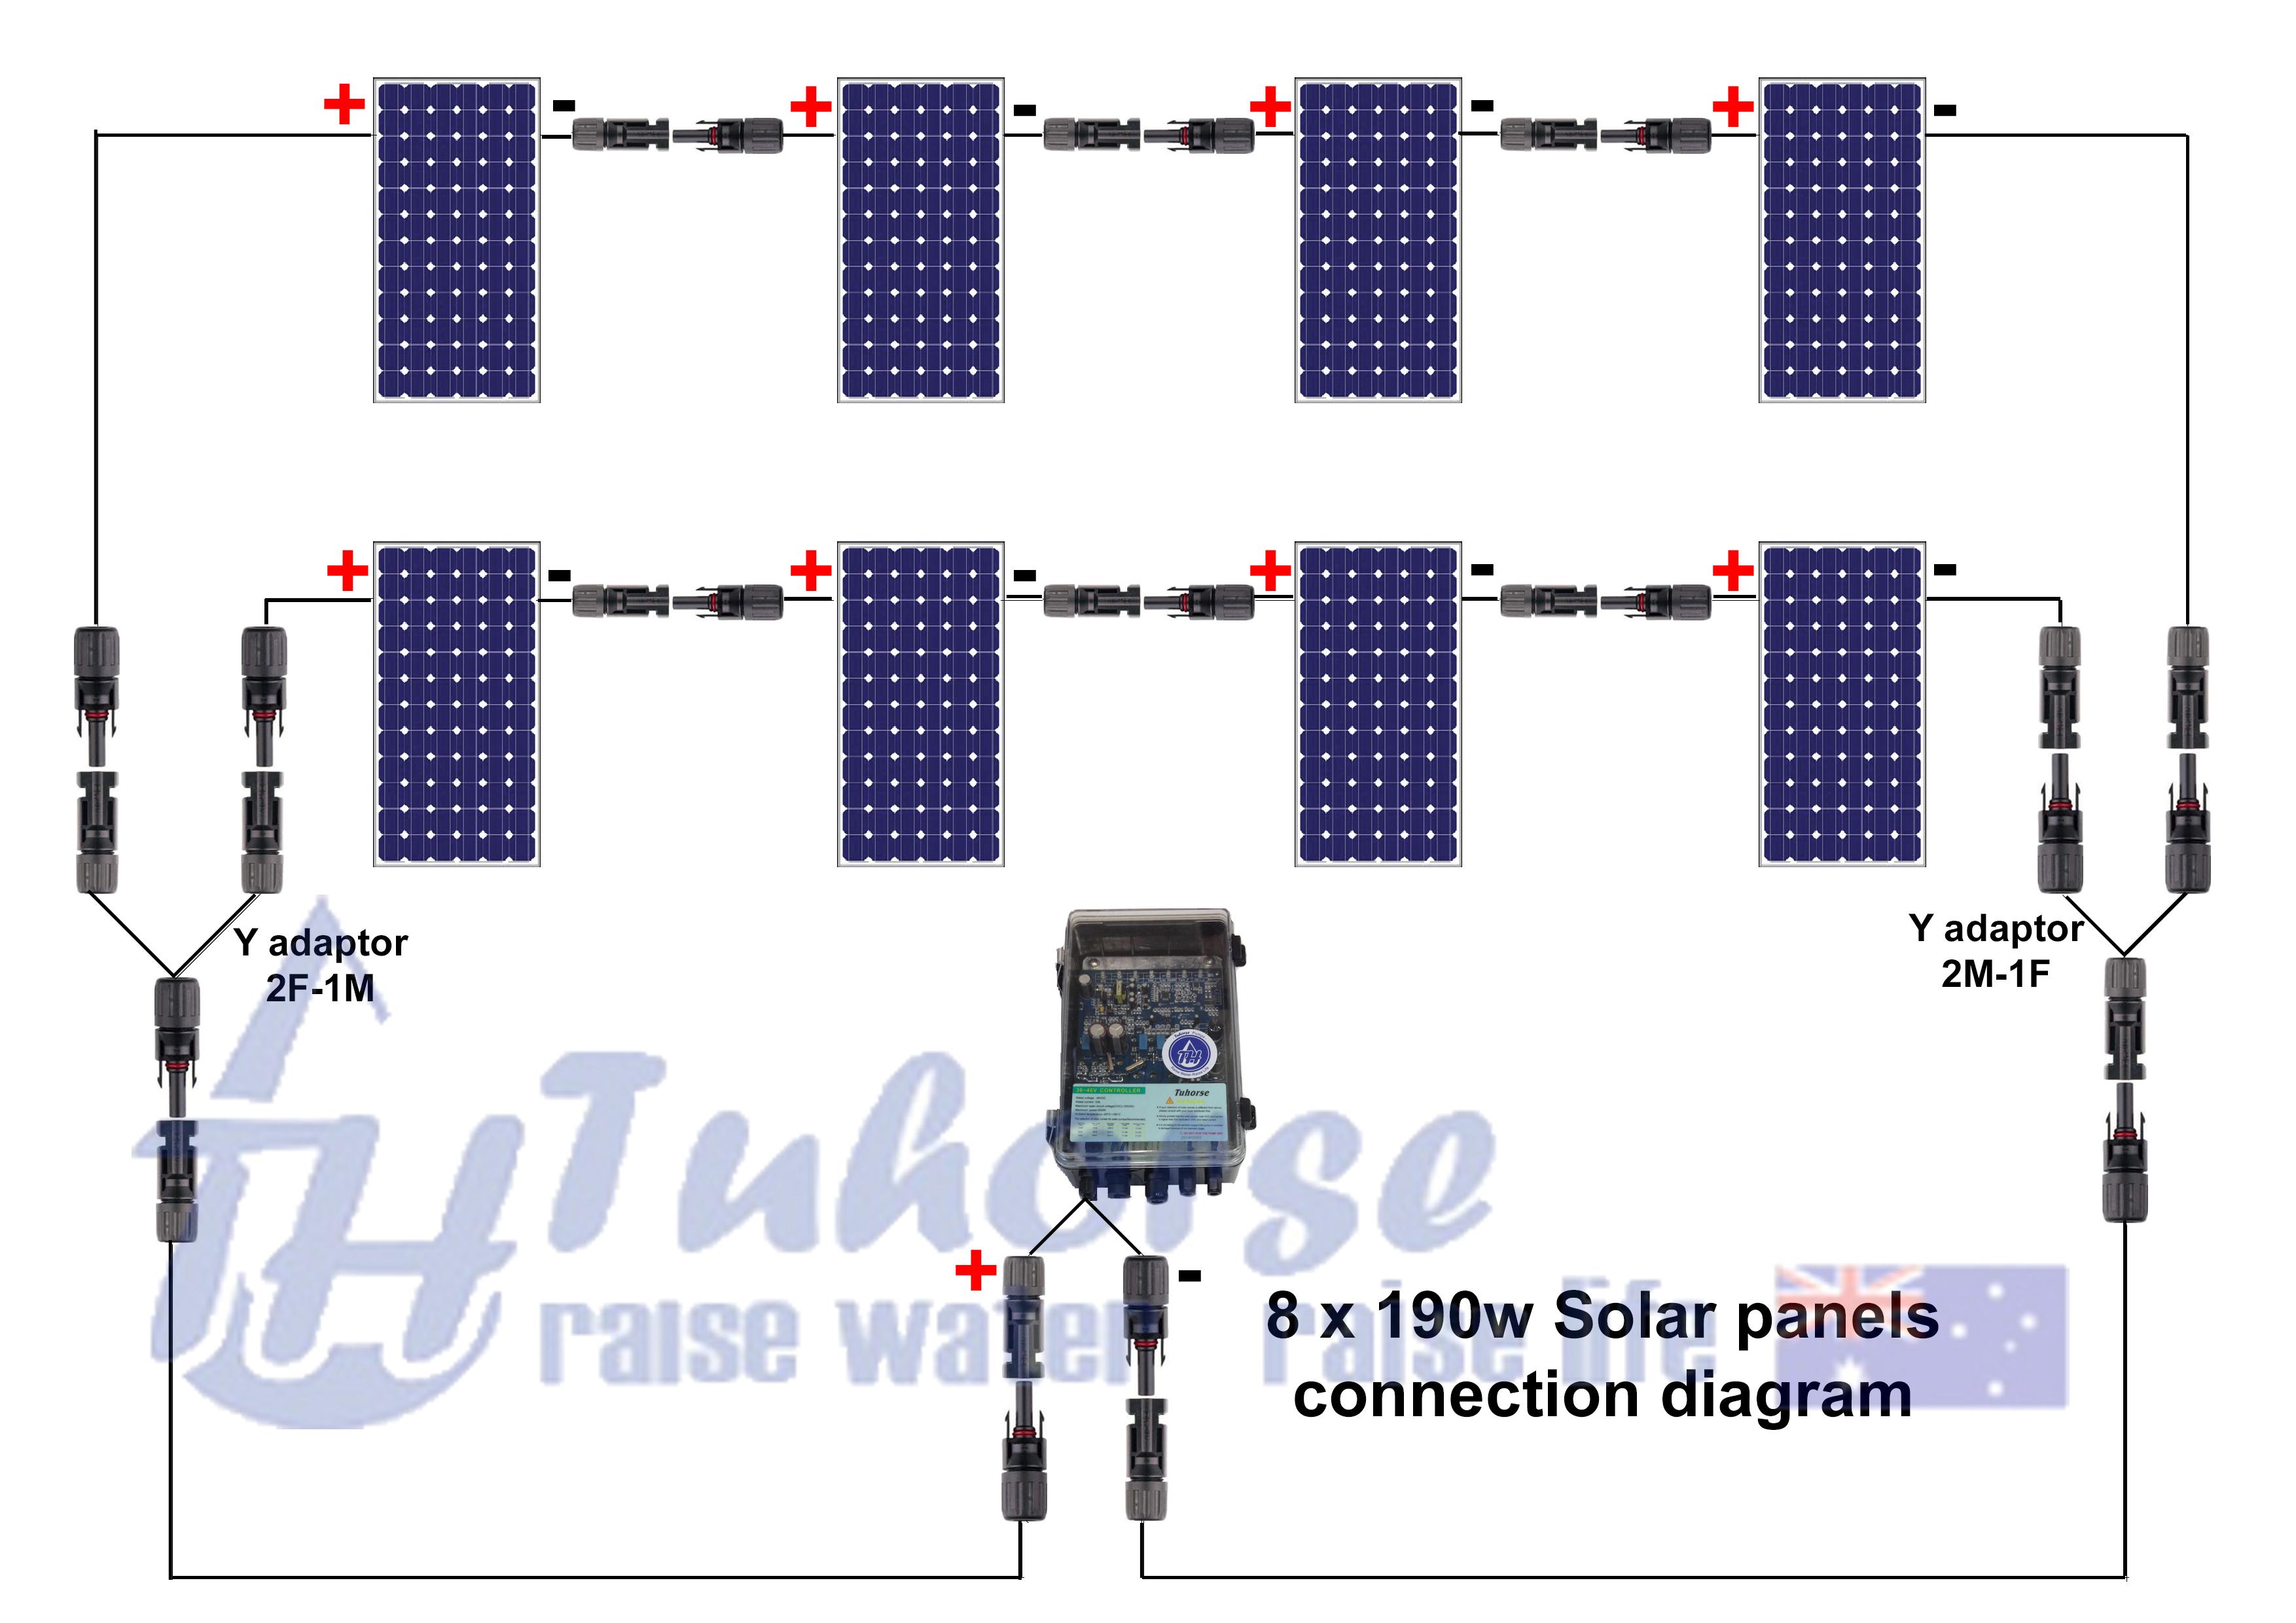 Wz 5928 Wiring Diagram Also Solar Panel System Wiring Diagram On Solar Array Free Diagram